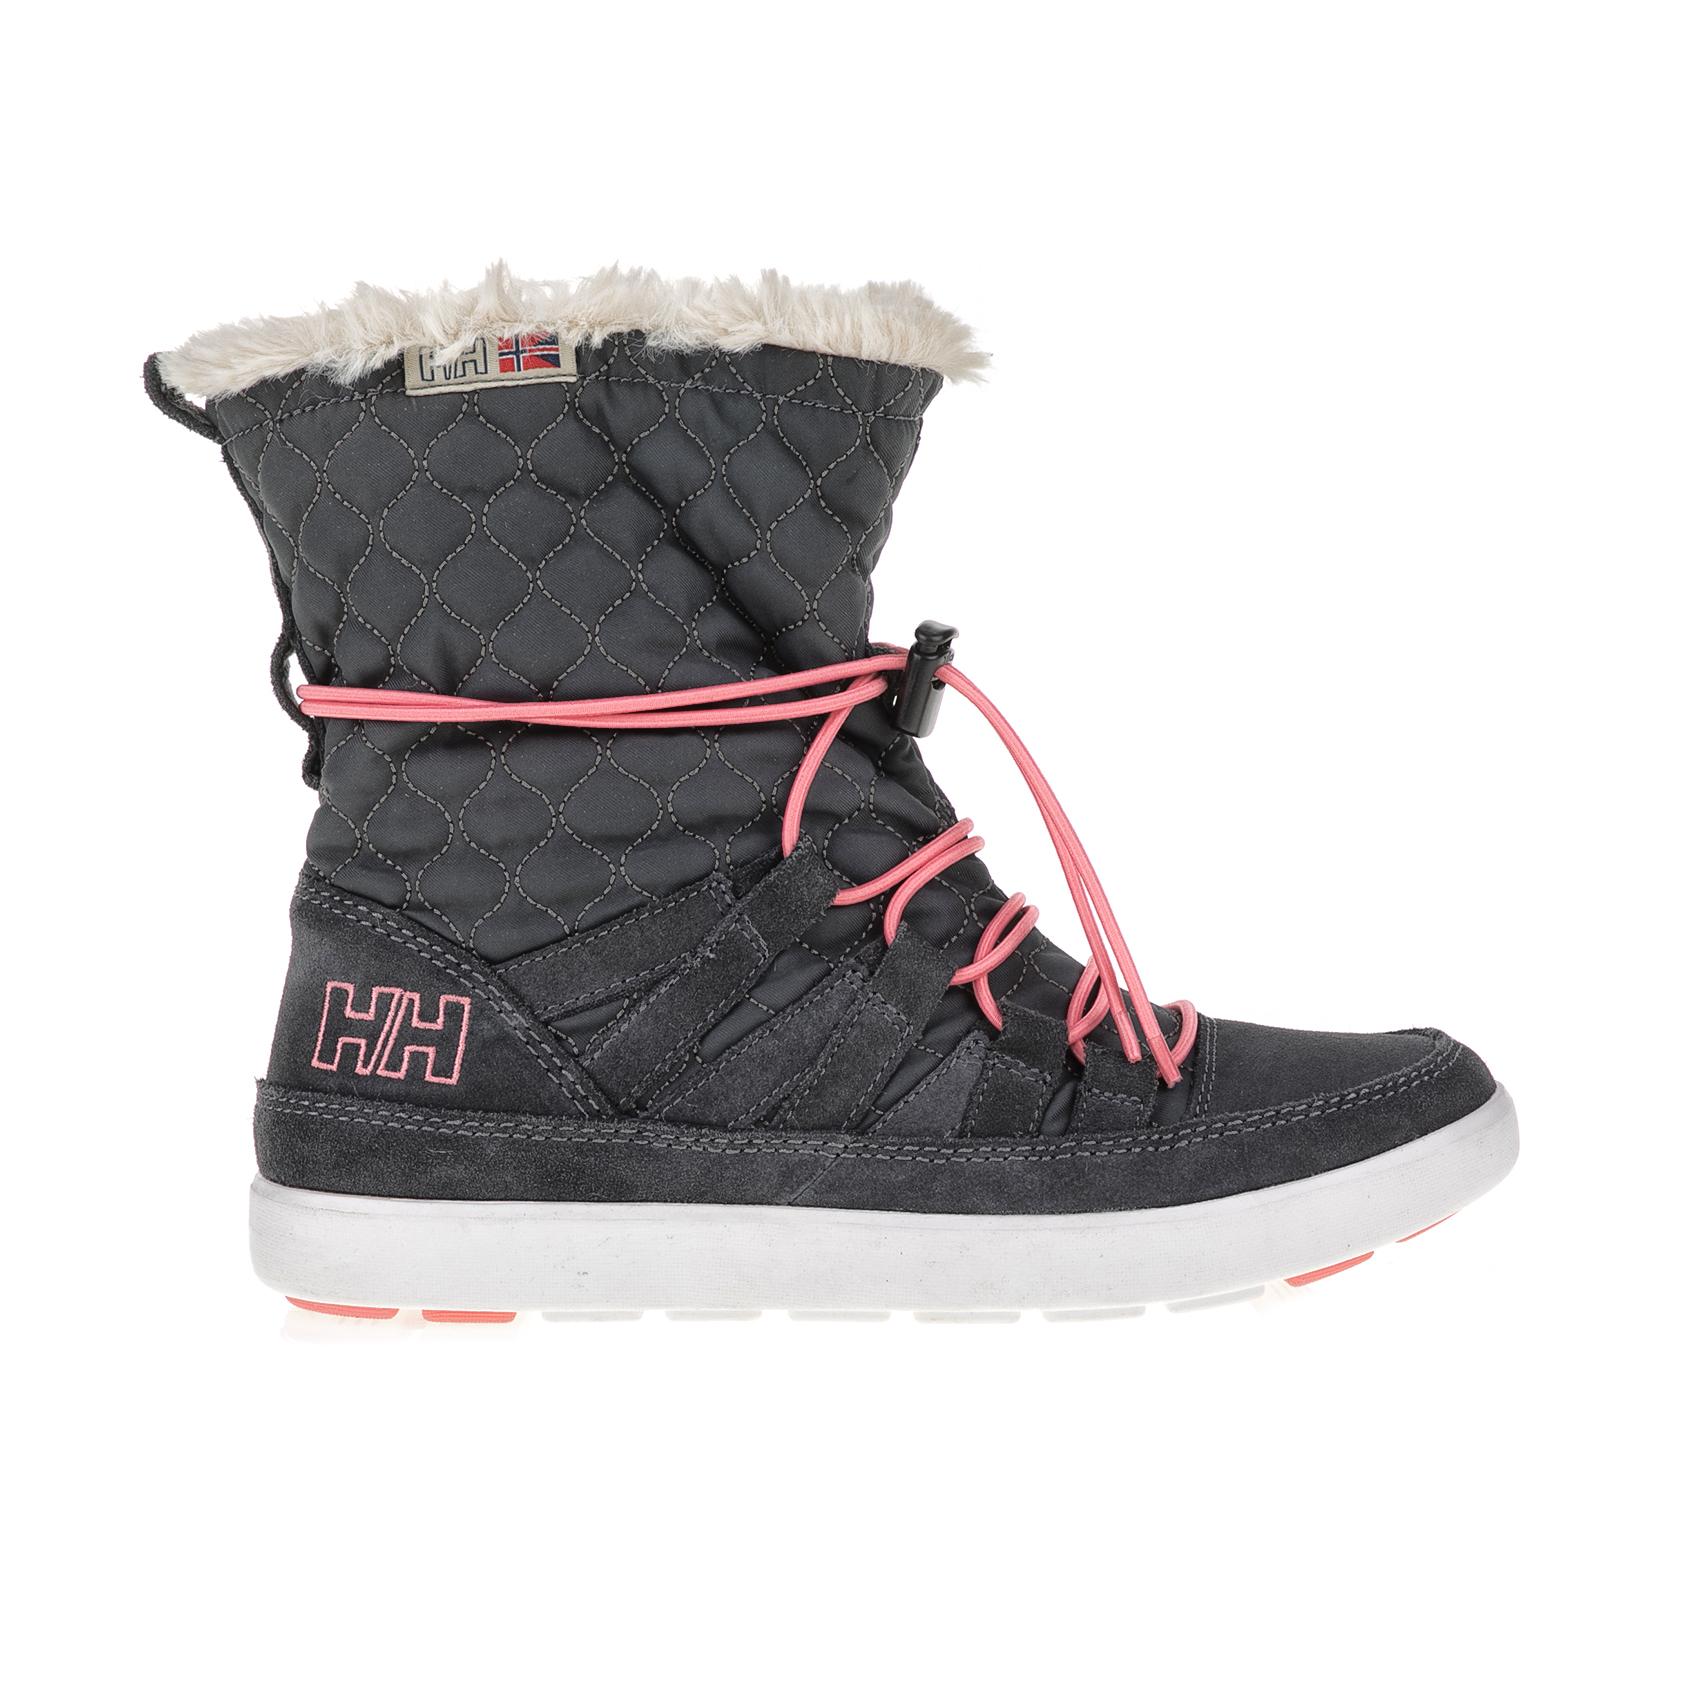 5c072c6a773 HELLY HANSEN - Γυναικείες μπότες HARRIET γκρι - ροζ